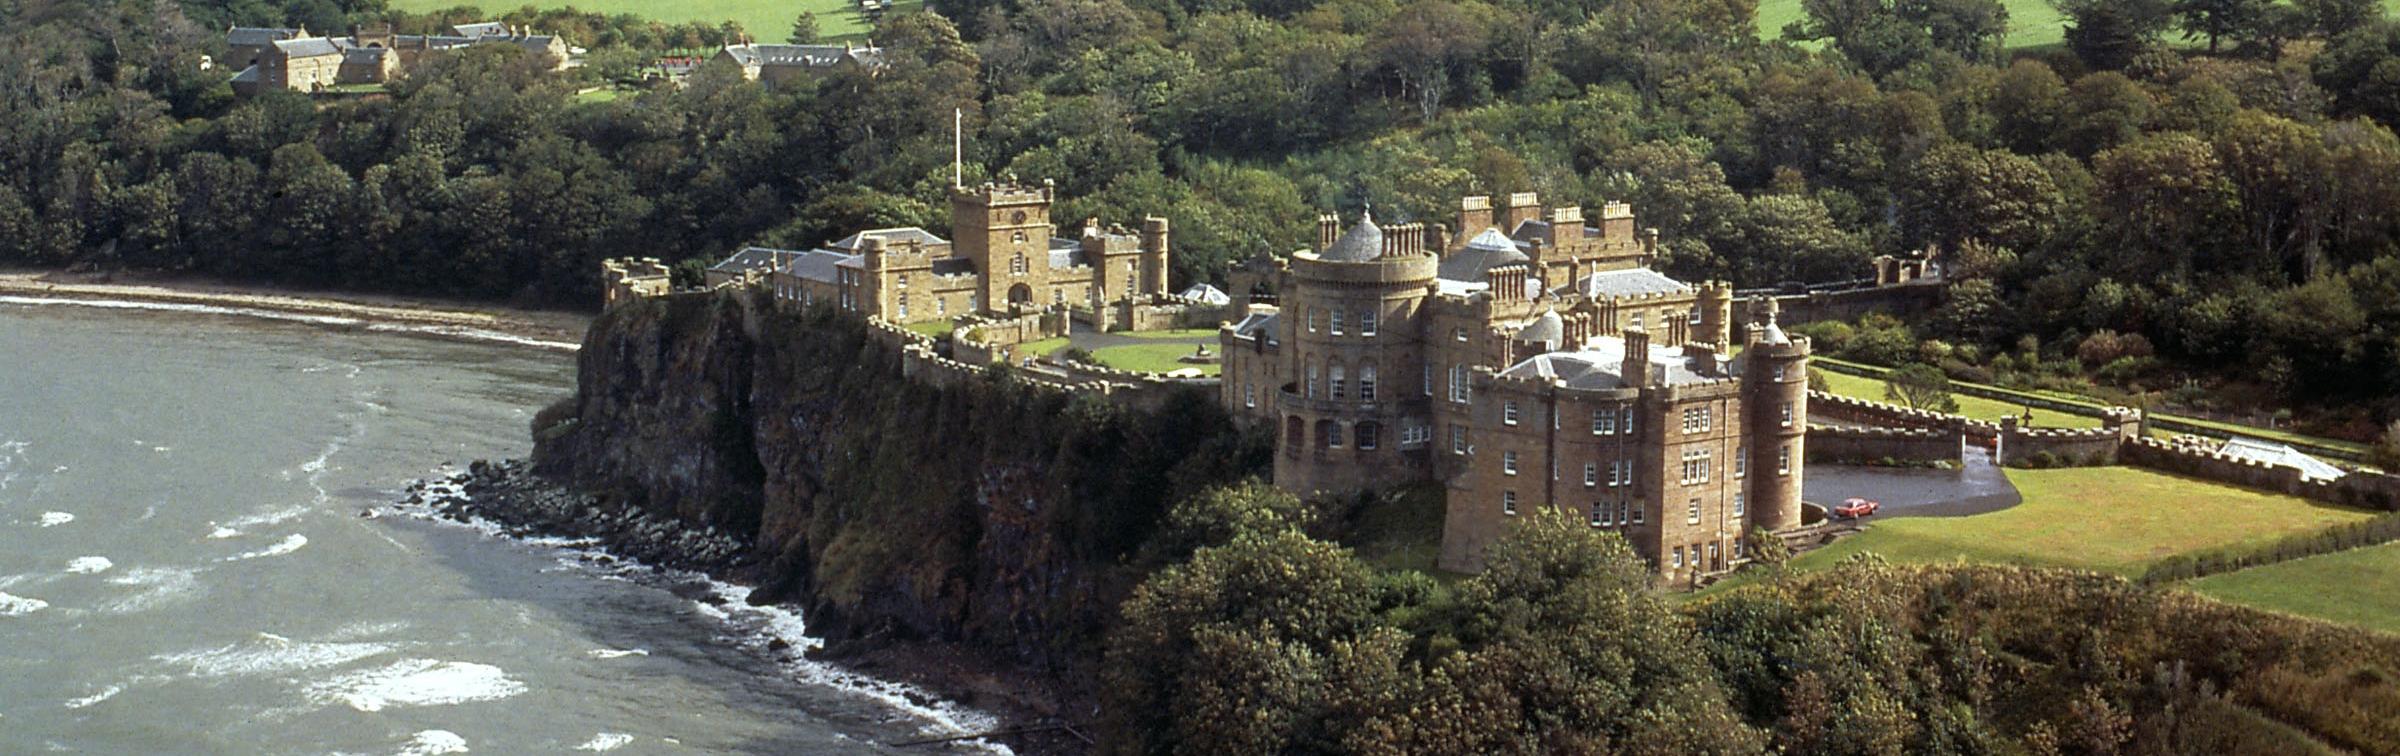 Culzean Castle   Ayrshire Visitor Attractions   Scottish Castle